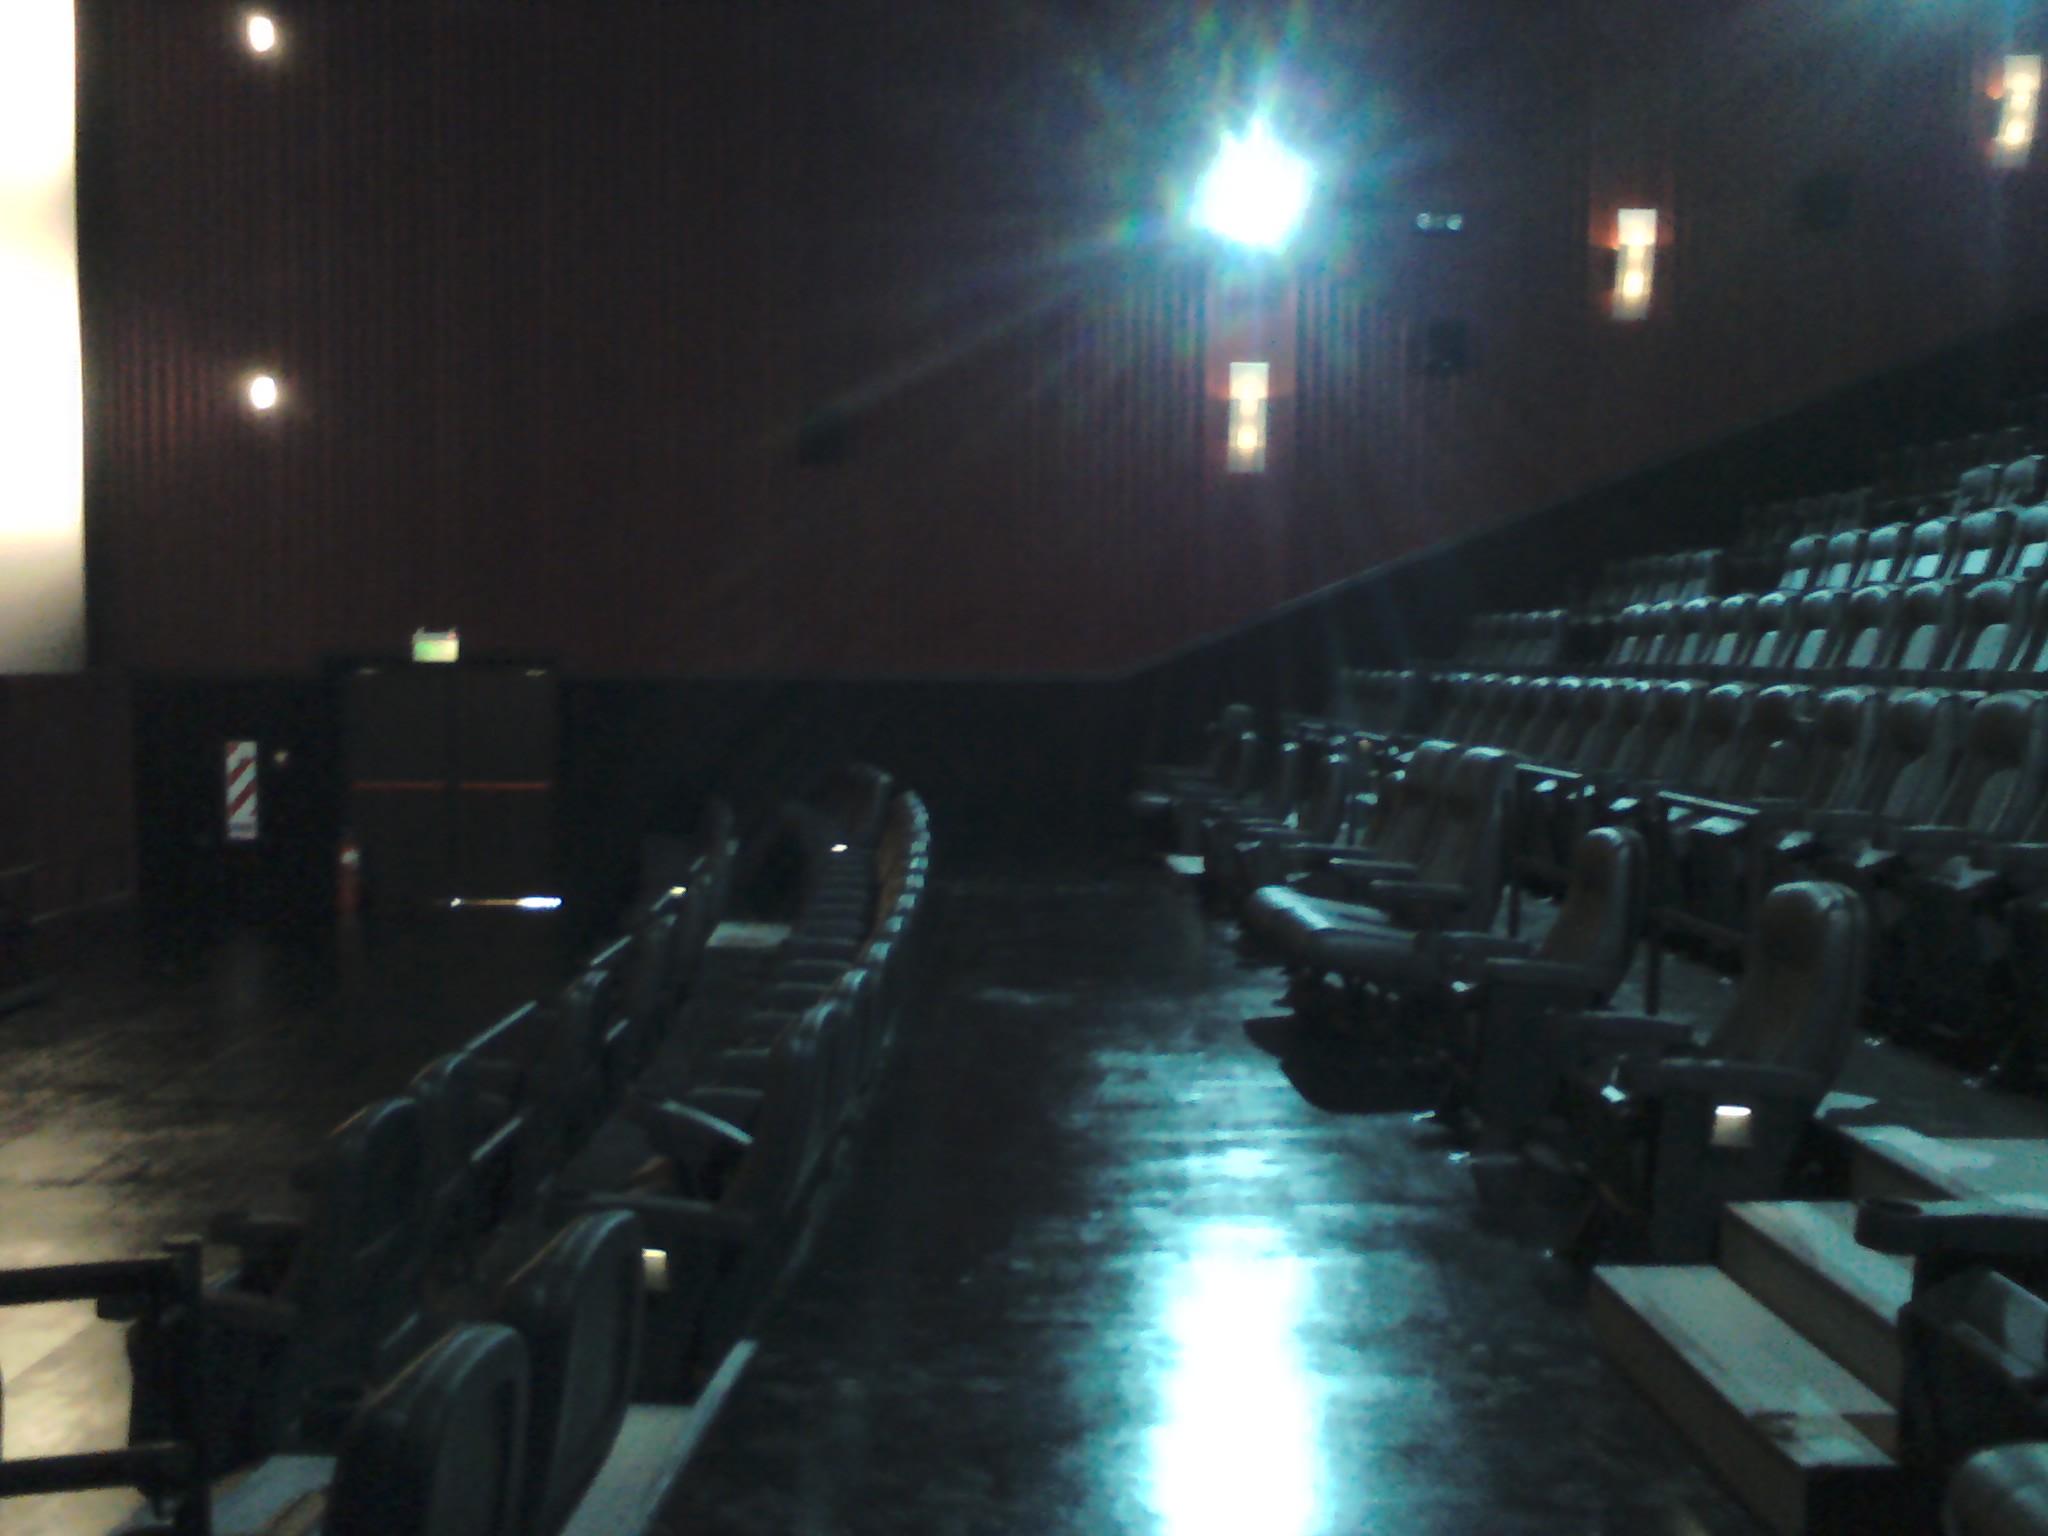 DOBILIA SA Construcciones - Cinemark Santa Fe - Sala 7 3D - 1